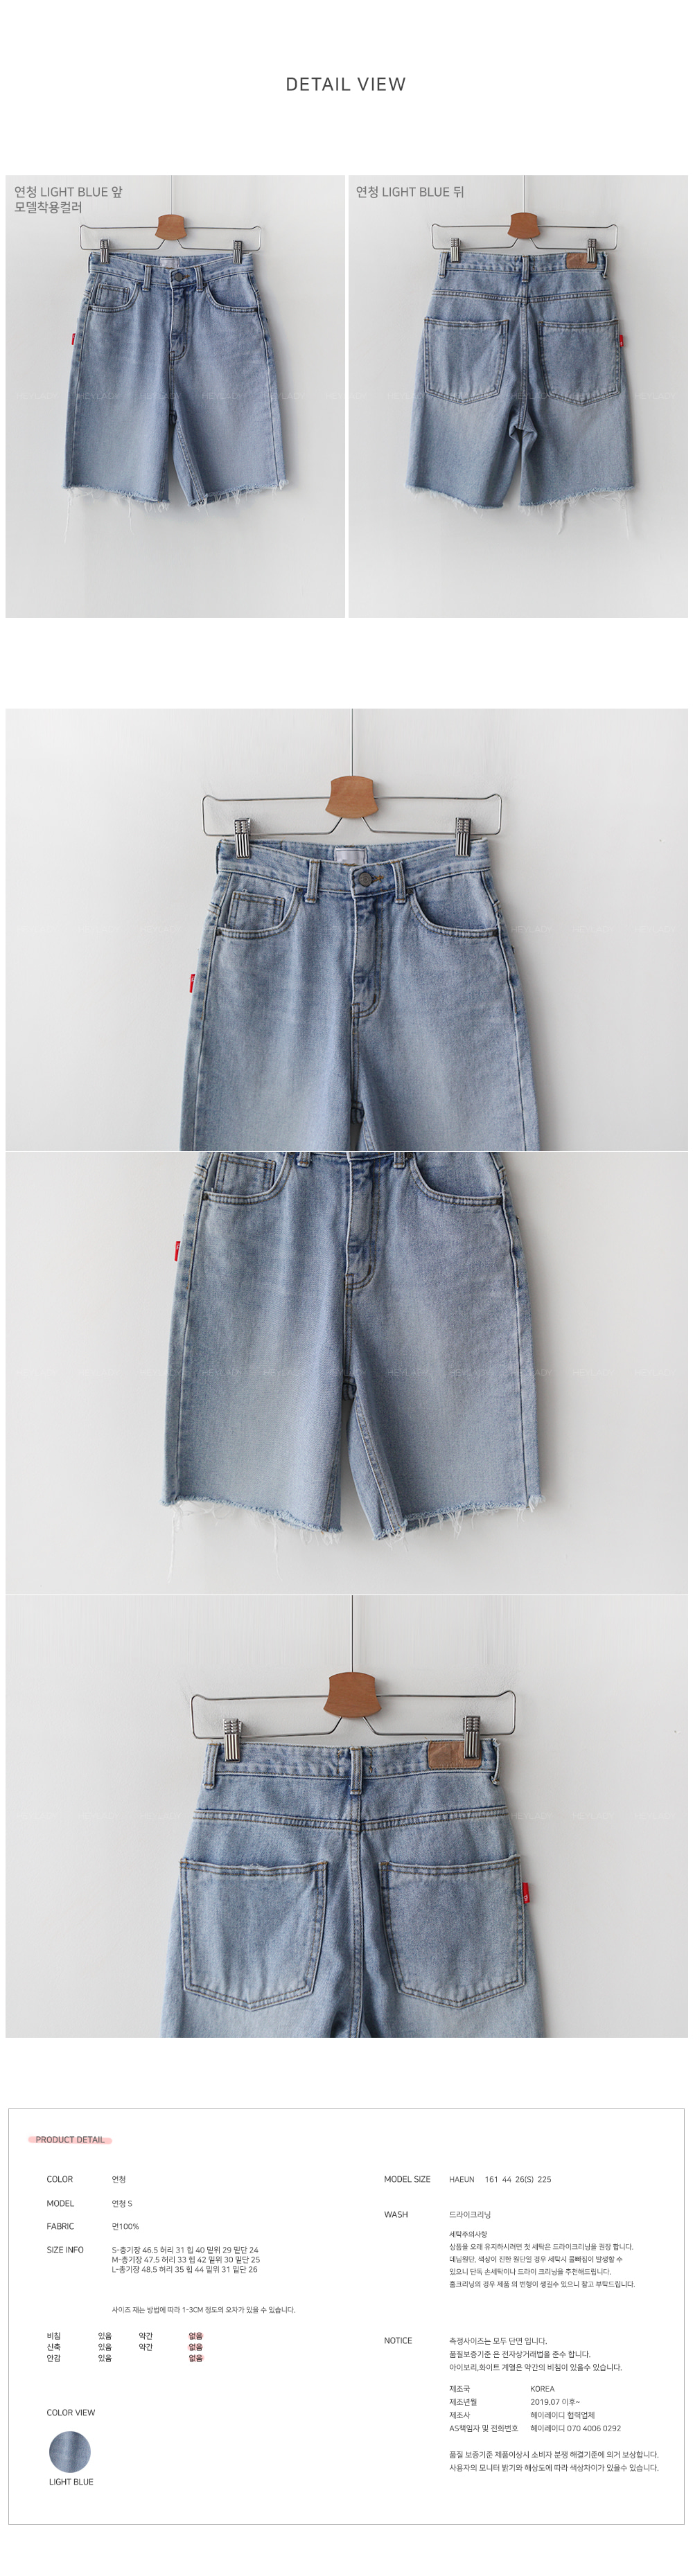 Bite Denim Short Pants